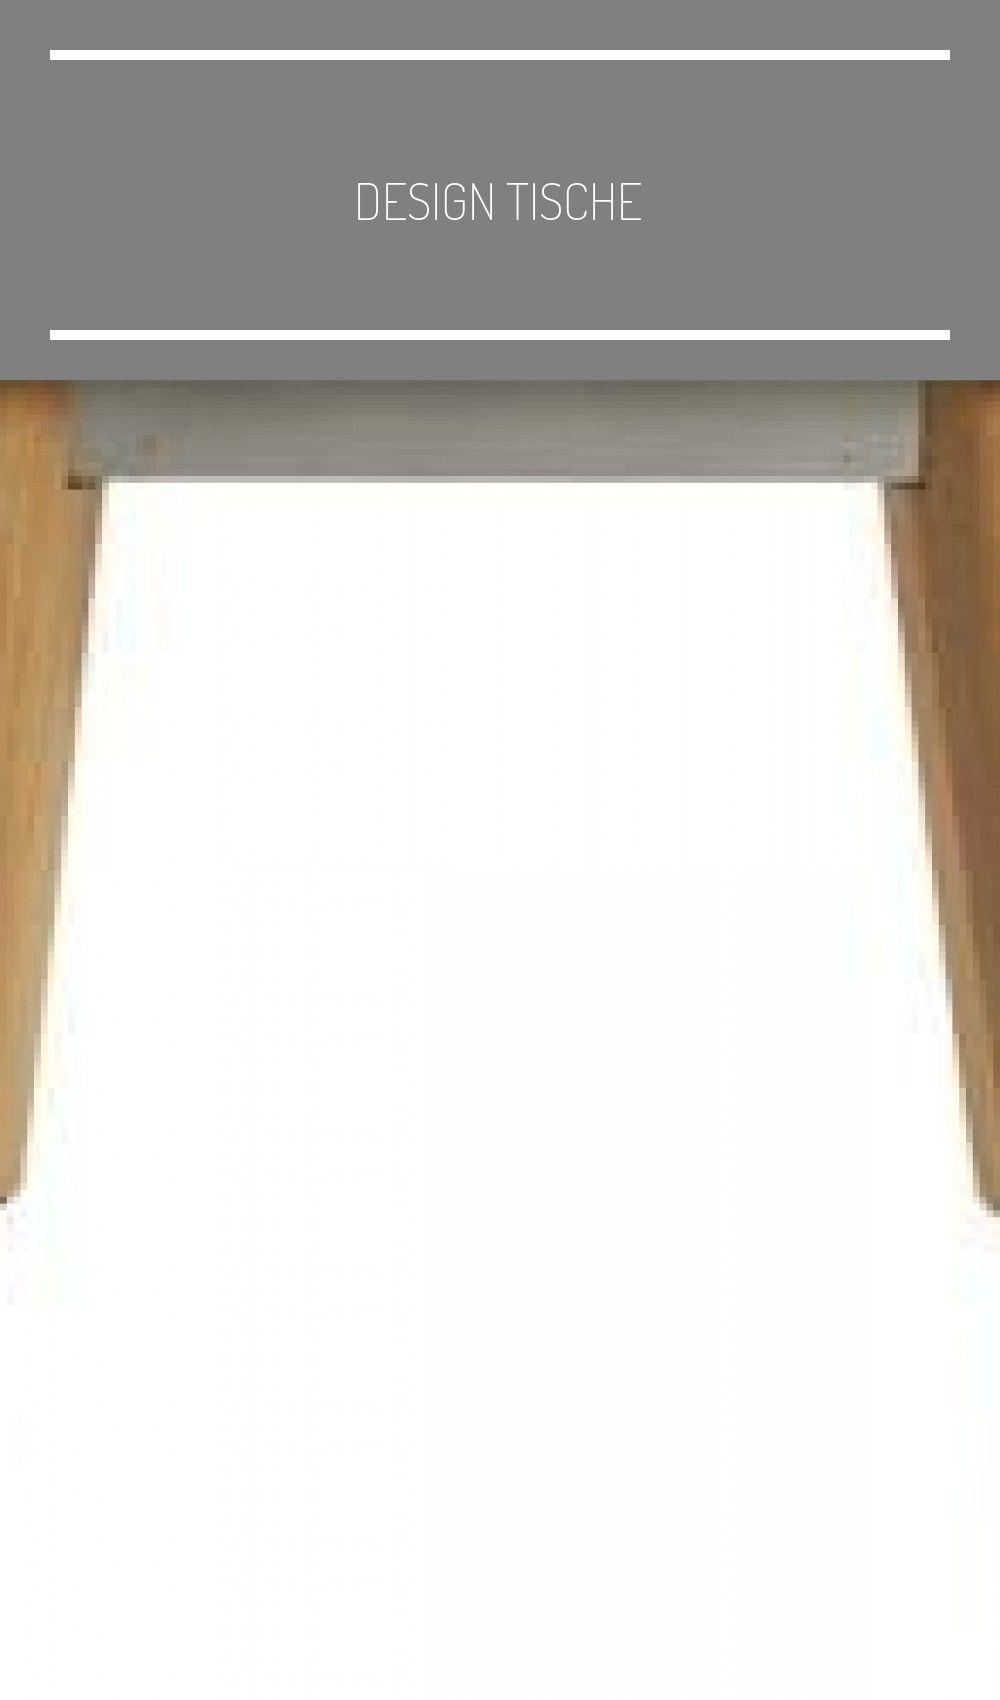 Design Tische Flat Screen